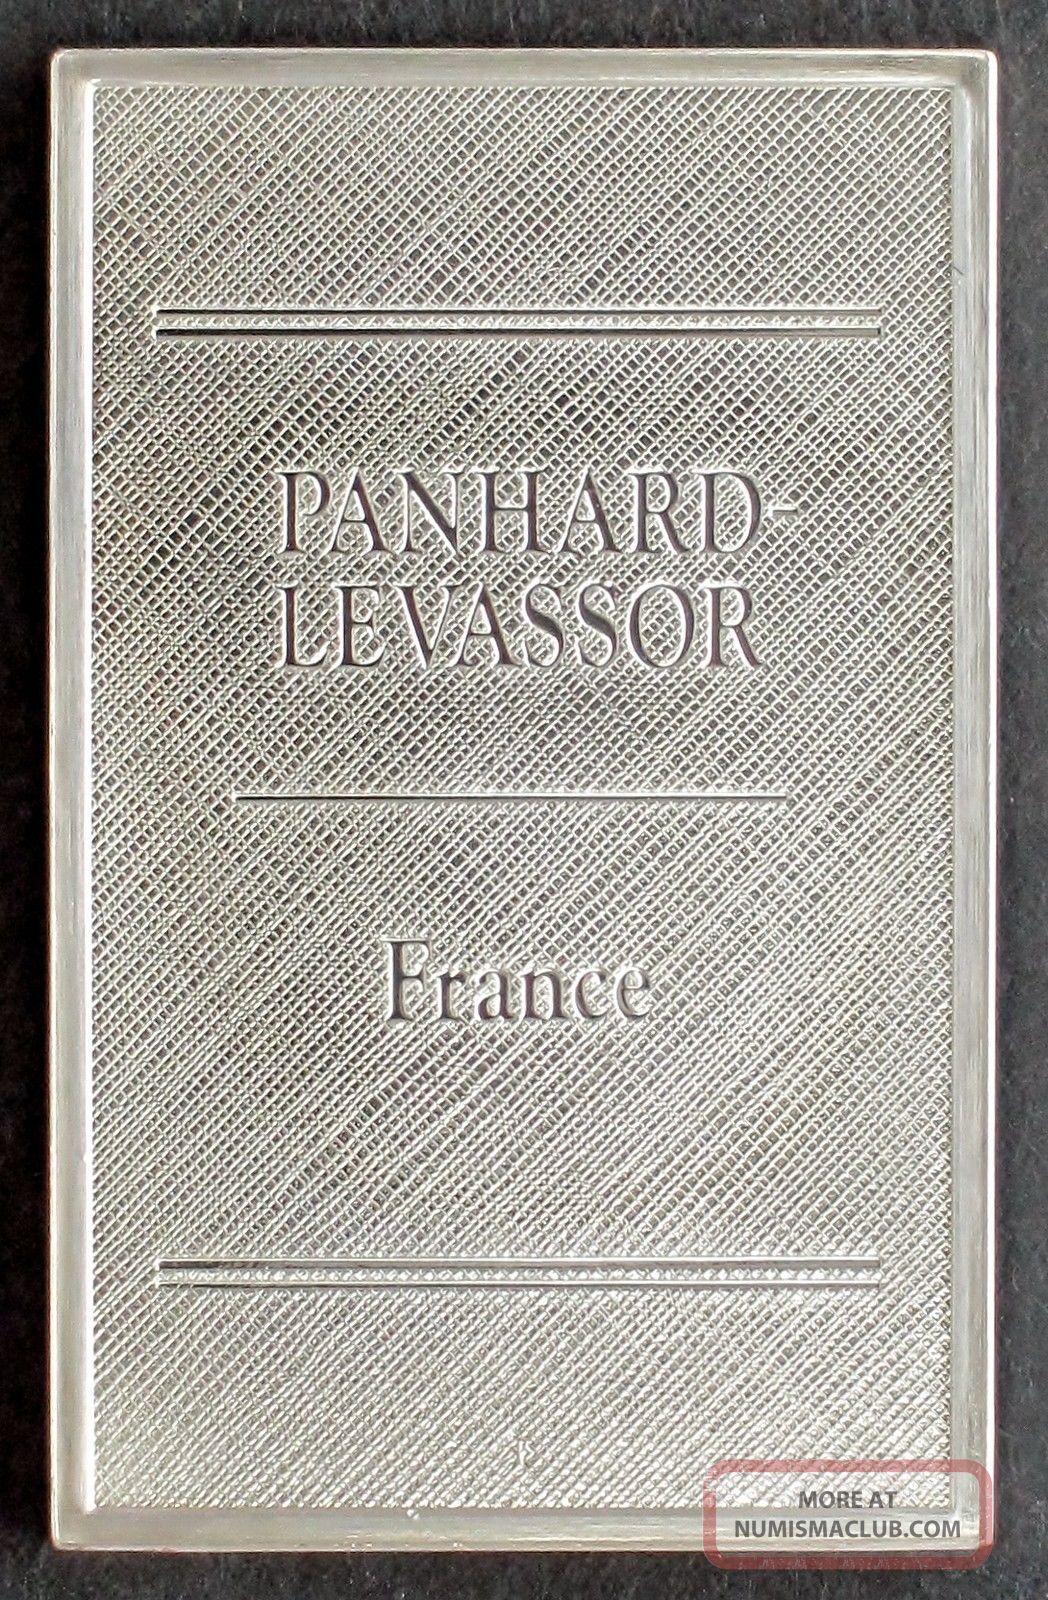 Panhard Levassor France Automobile Emblem 0 76 Oz